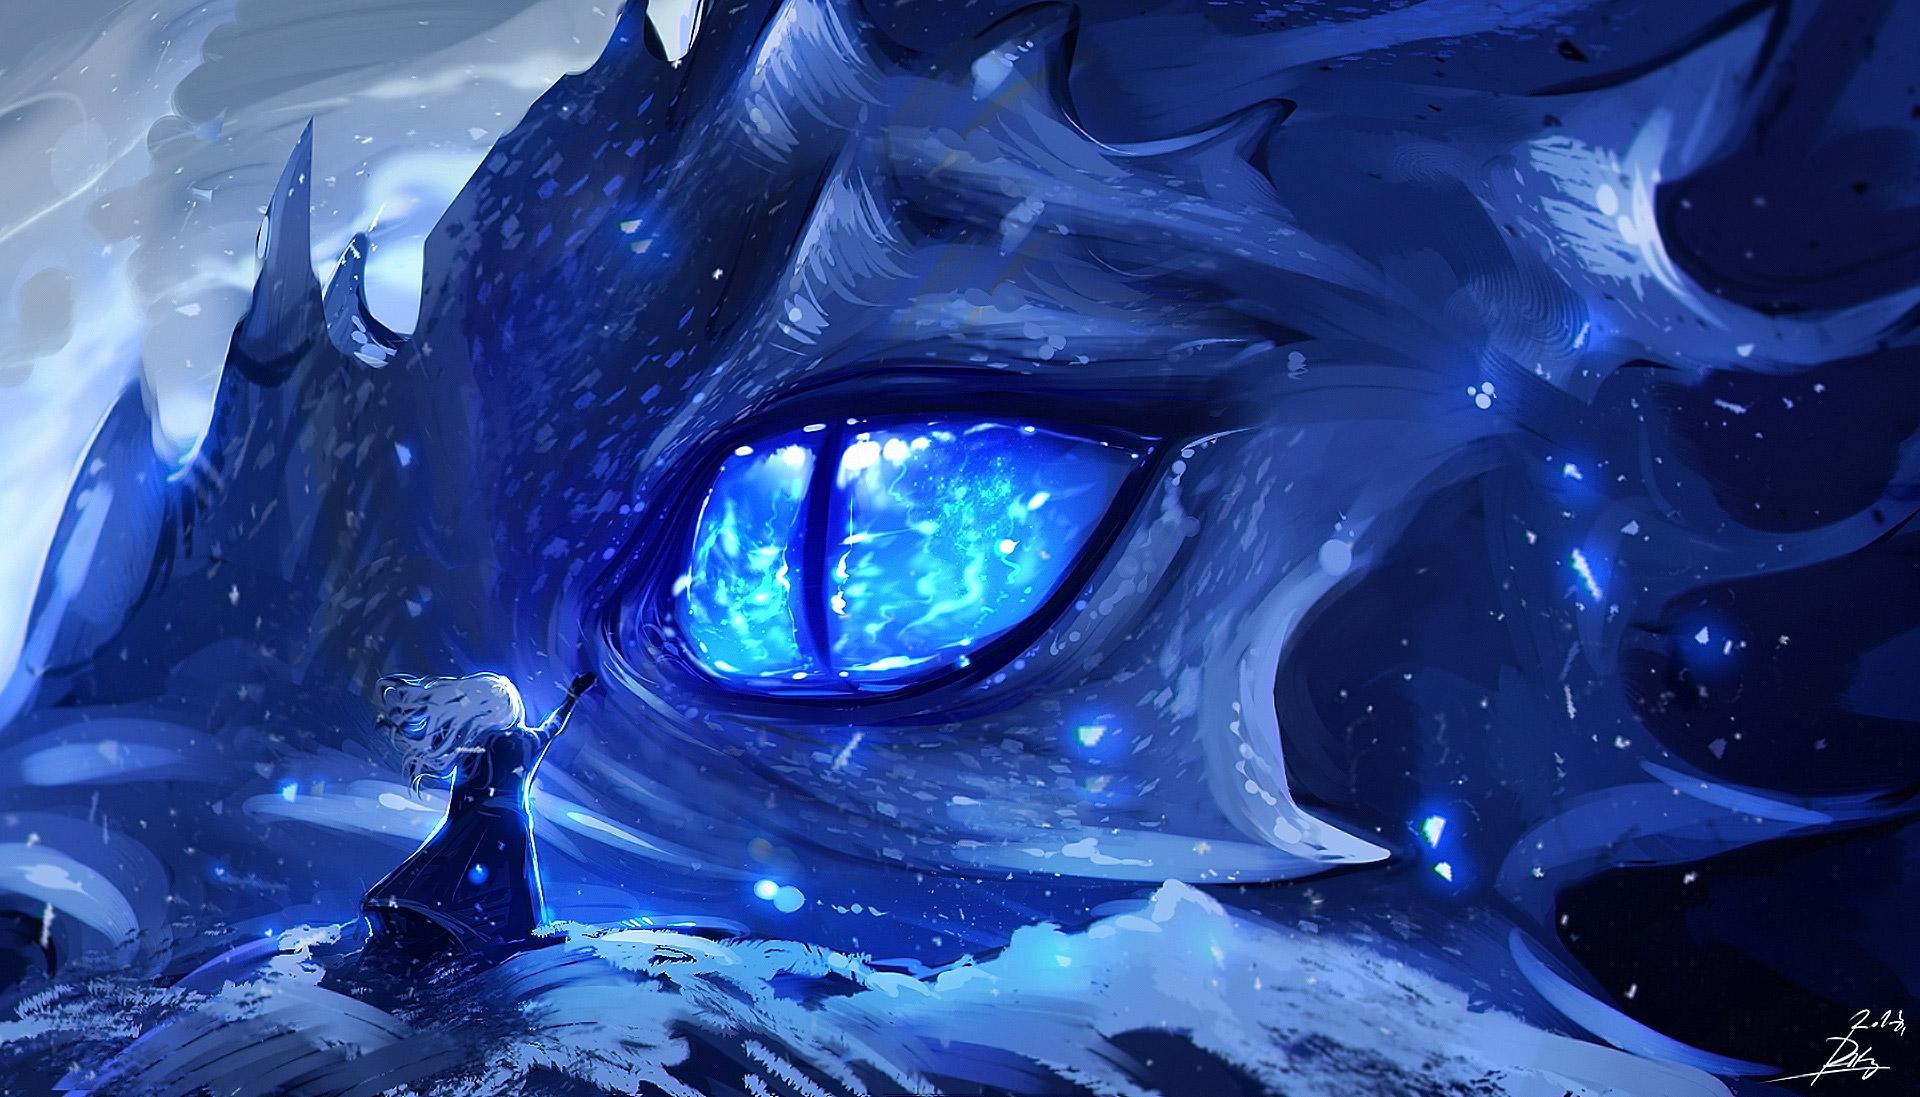 2560x1024 Hd Wallpaper Anime Dragon Eye Hd Anime 4k Wallpapers Images